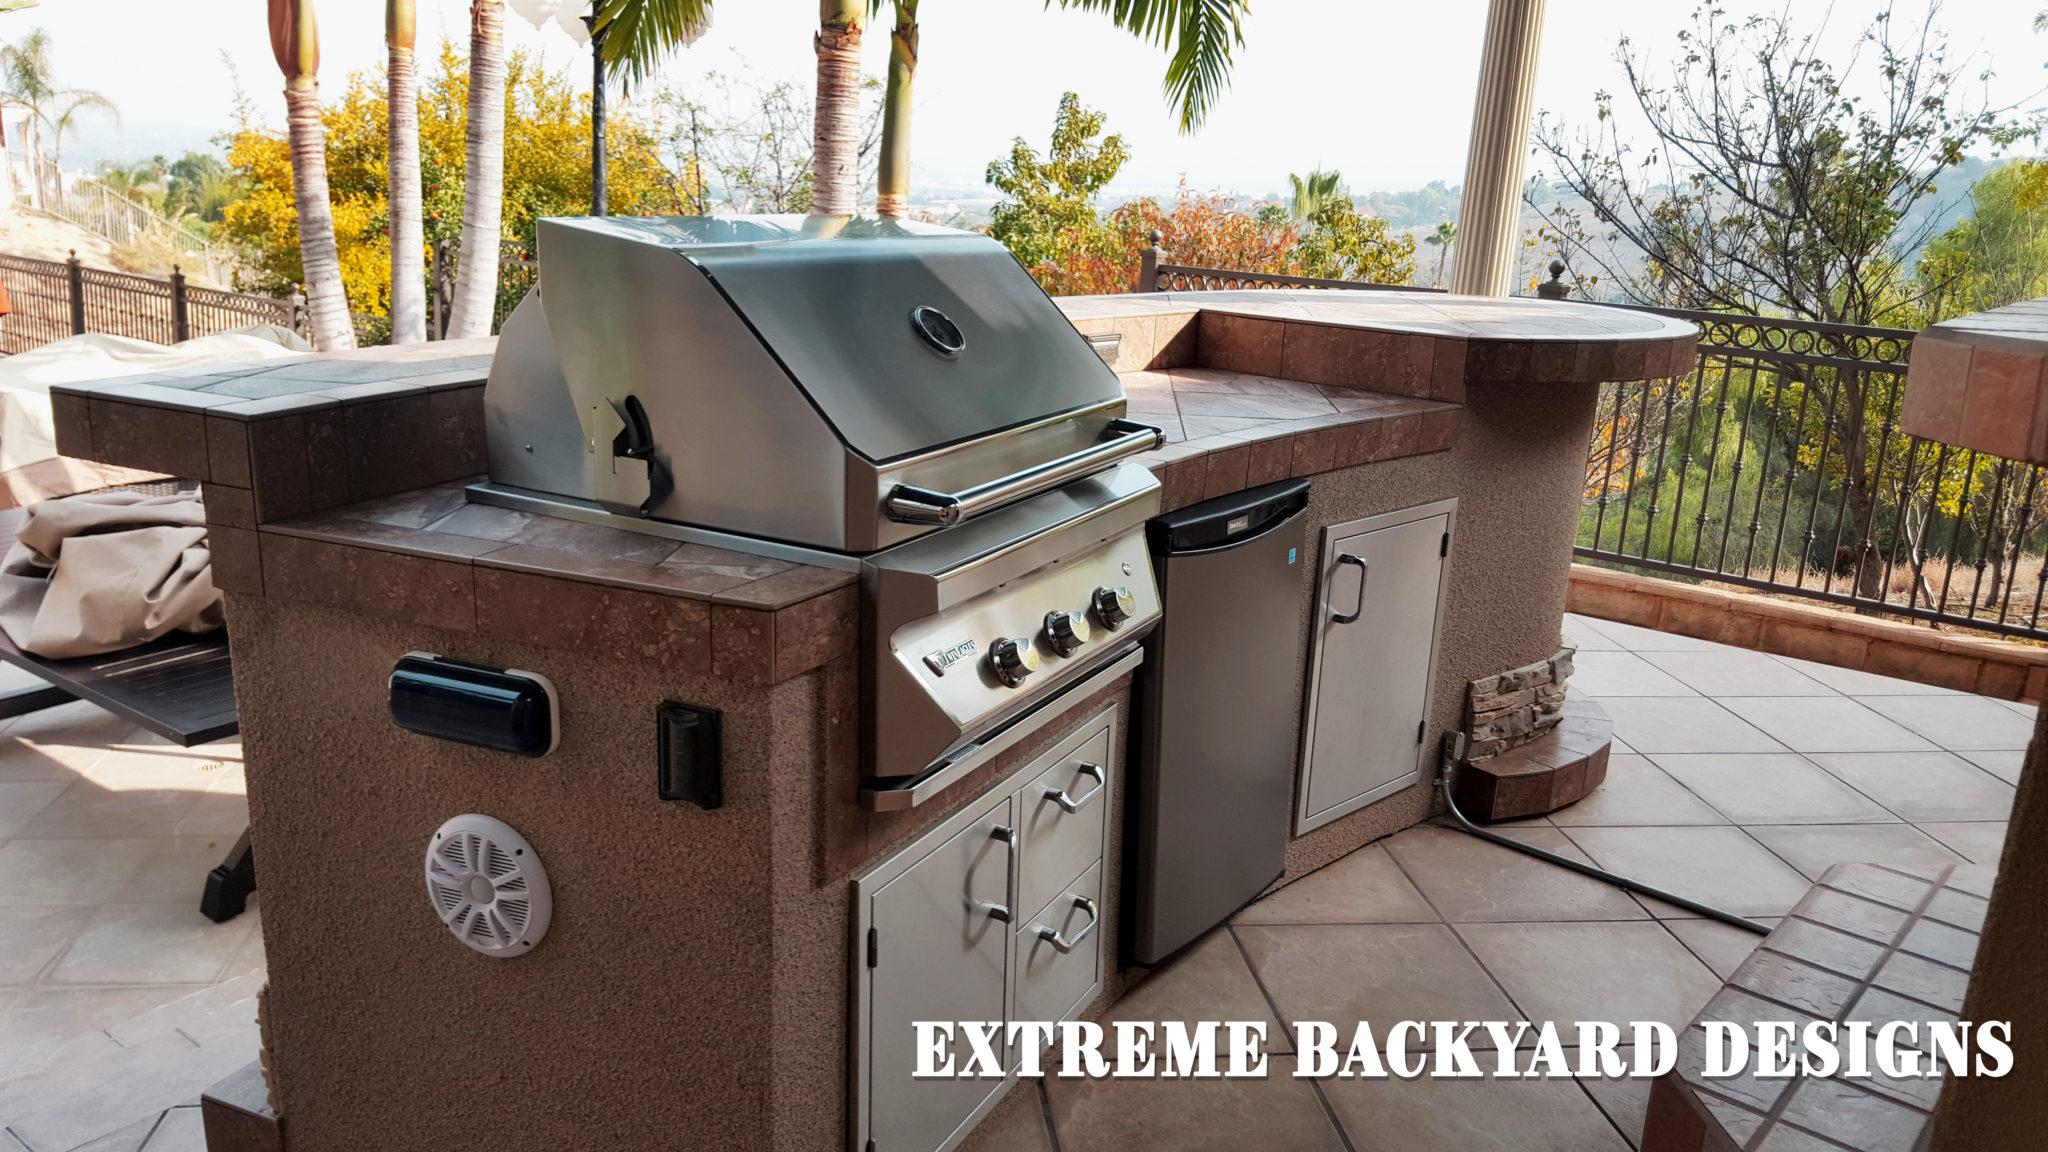 BBQ Islands Corona | Extreme Backyard Designs on Backyard Patio Grill Island id=22510